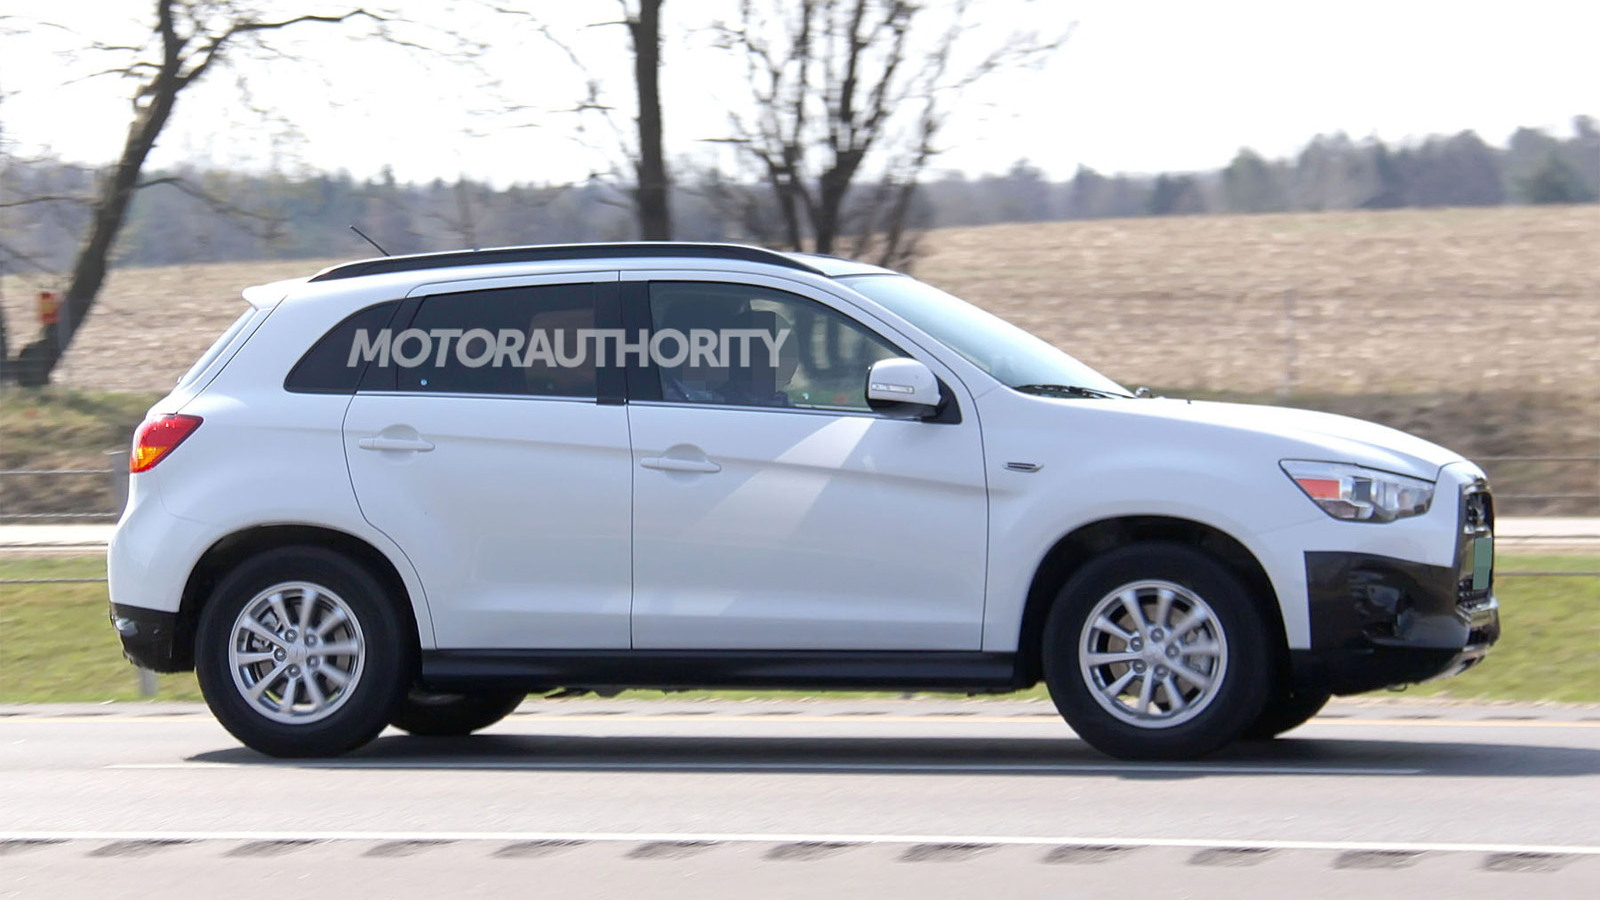 2013 Mitsubishi Outlander Sport facelift spy shots